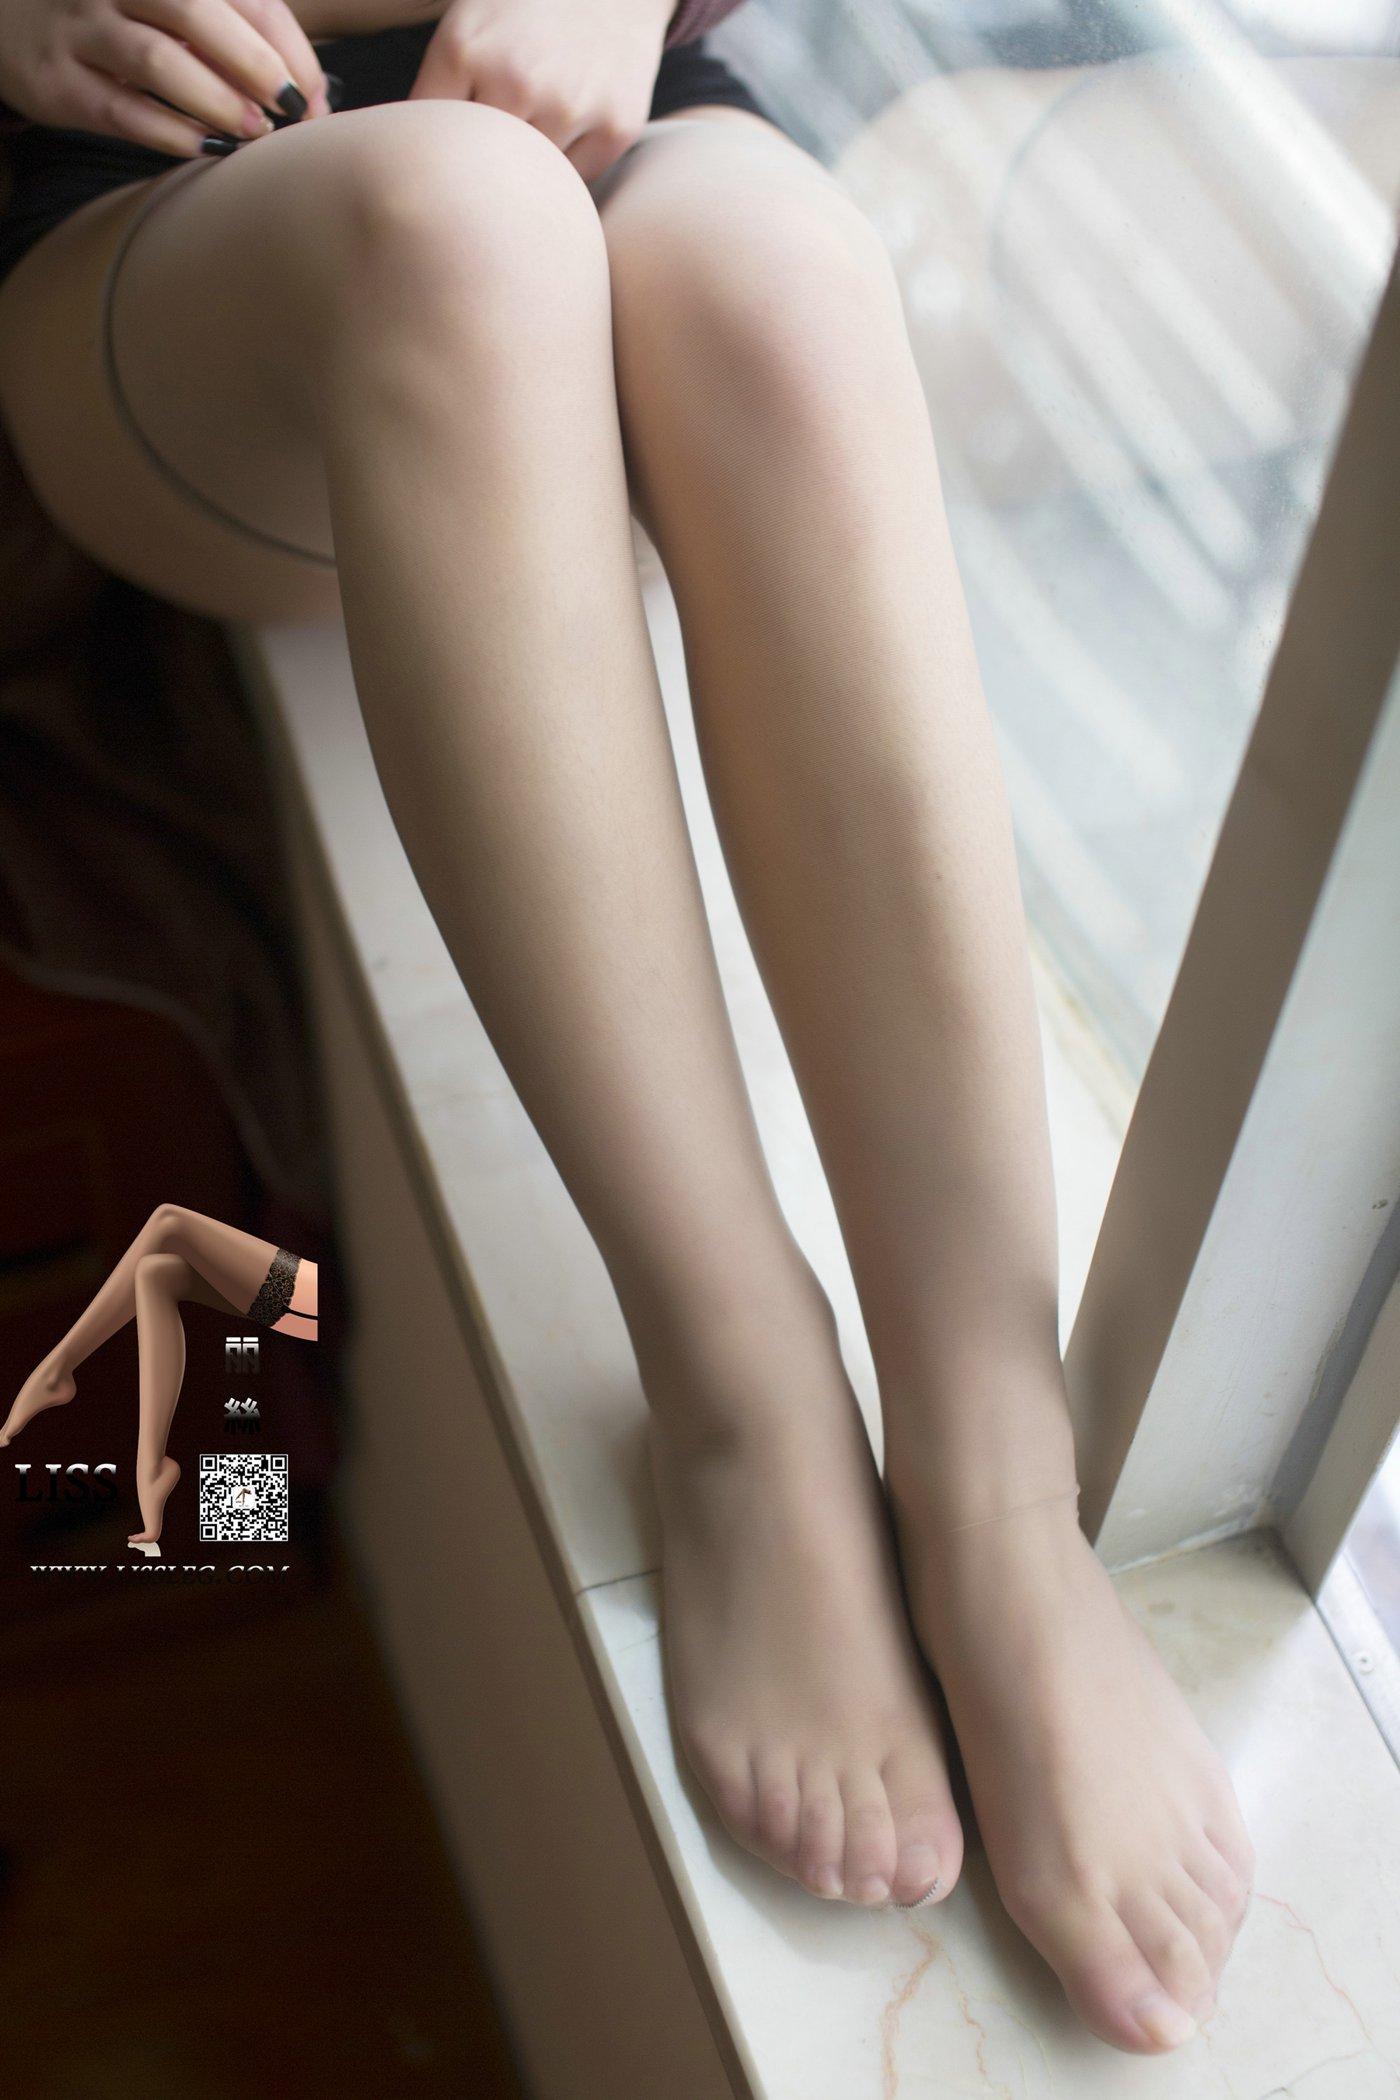 [LISS丽丝映像]NO.005 琴川小姐姐的爱丝情蜜初の体验[97P]